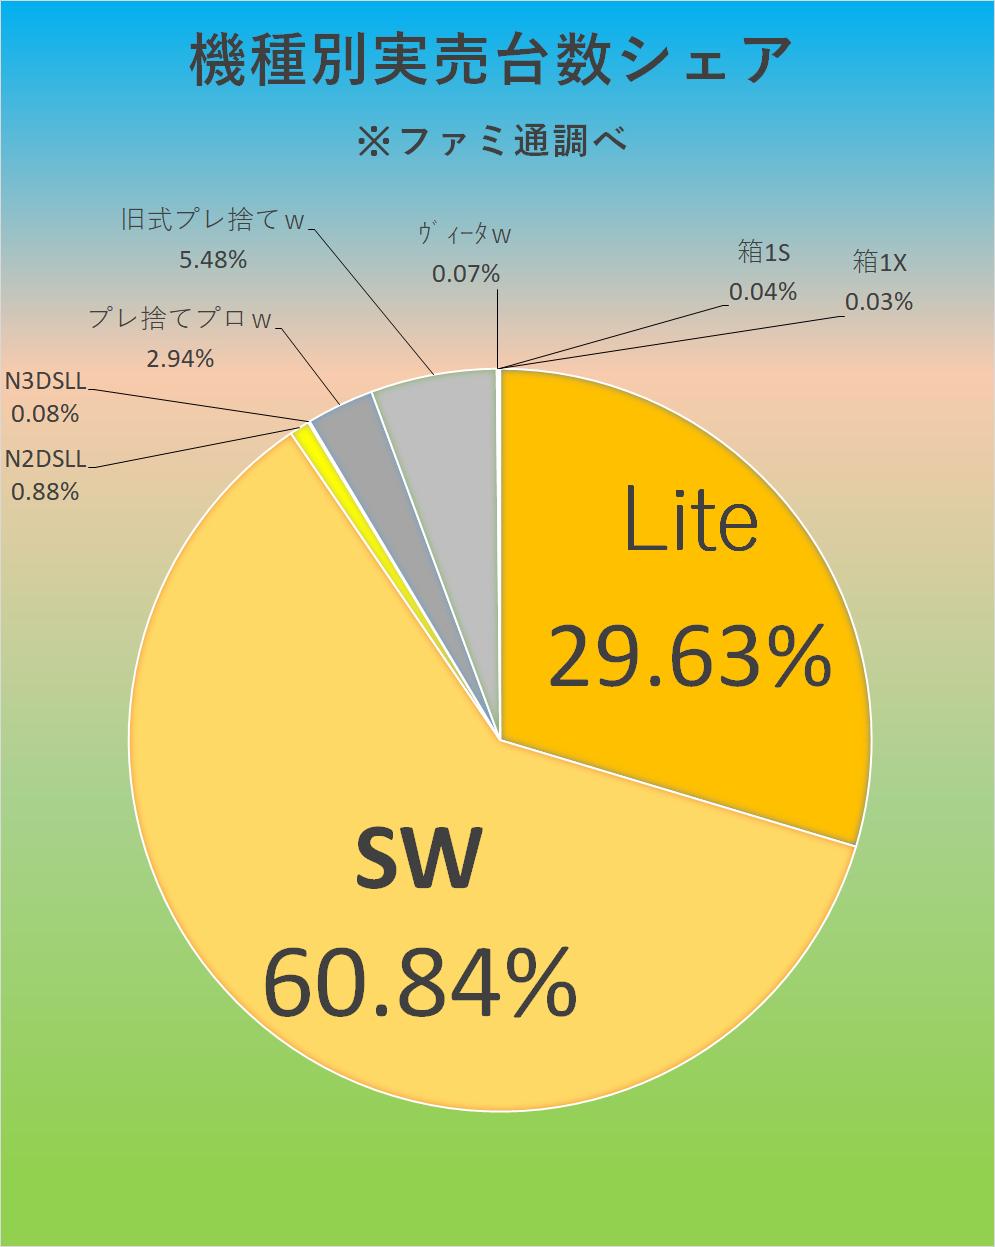 7974 - 任天堂(株) 【 ファミ通実売結果♪ 】  1/20-26集計  SW/4万5720! Lite/2万2267!